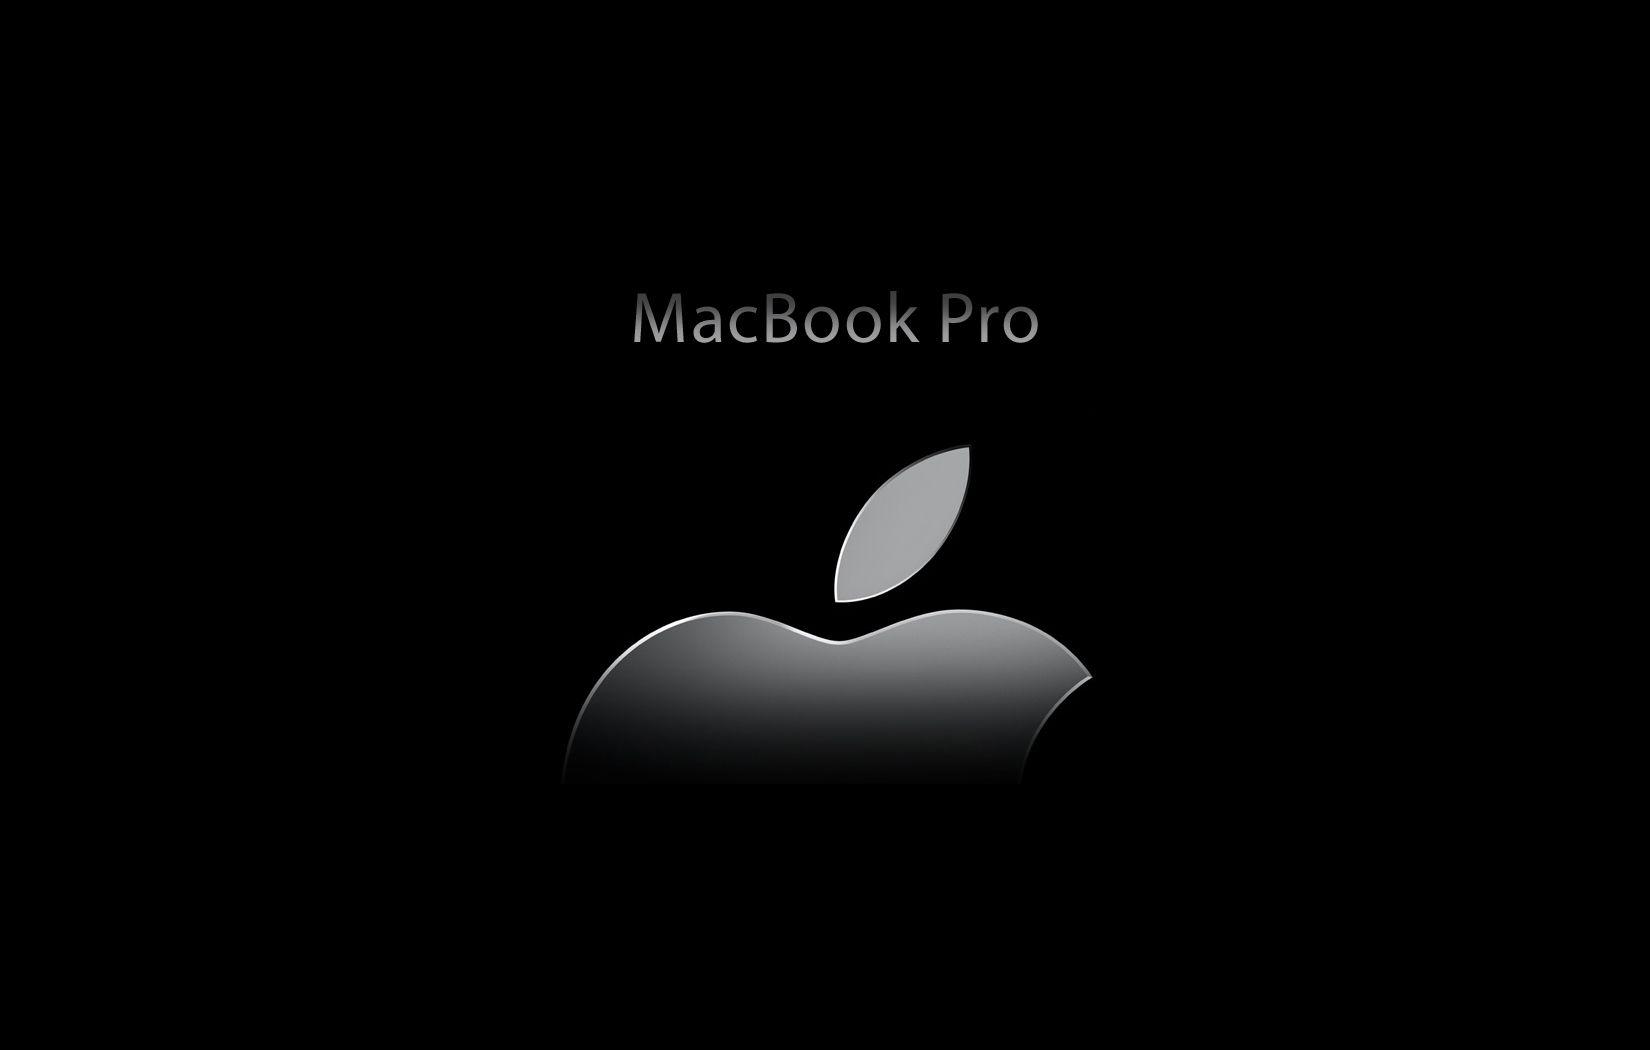 Hd wallpaper macbook - Awesome Macbook Laptop Hd Wallpapers Check More At Http Scottsdigital Com